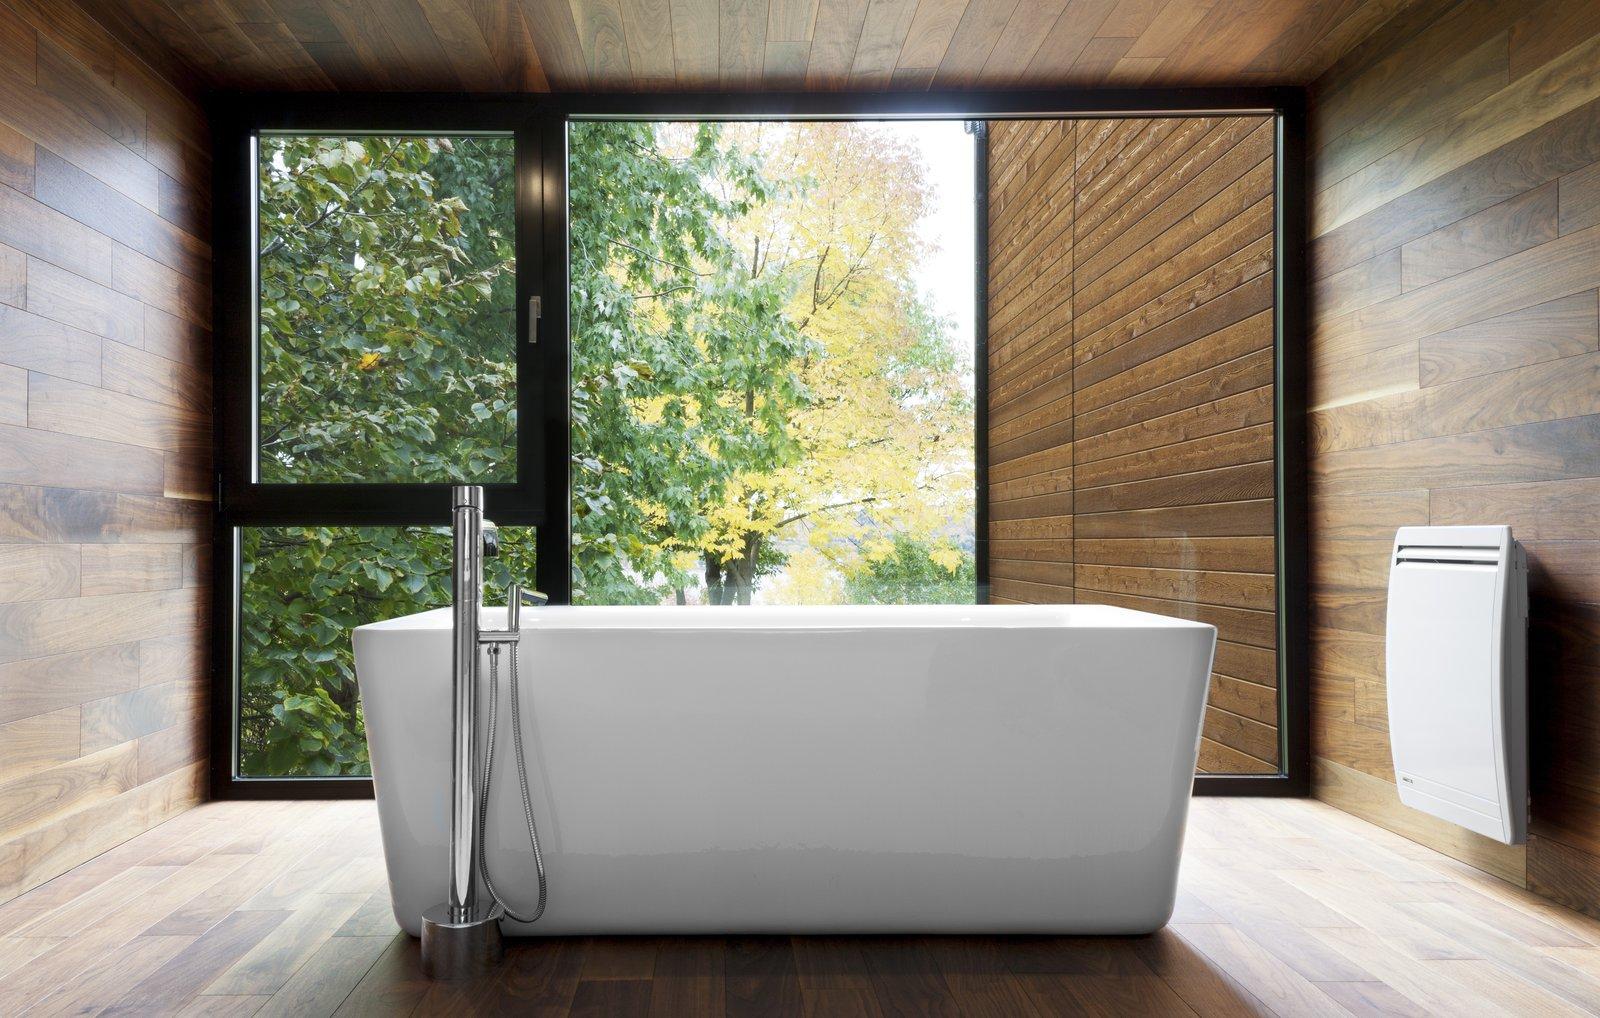 Bathroom at Rue de l'Anse residence - PARKA Architecture & Design - Quebec city, Canada  Rue de l'Anse residence by PARKA - Architecture & Design